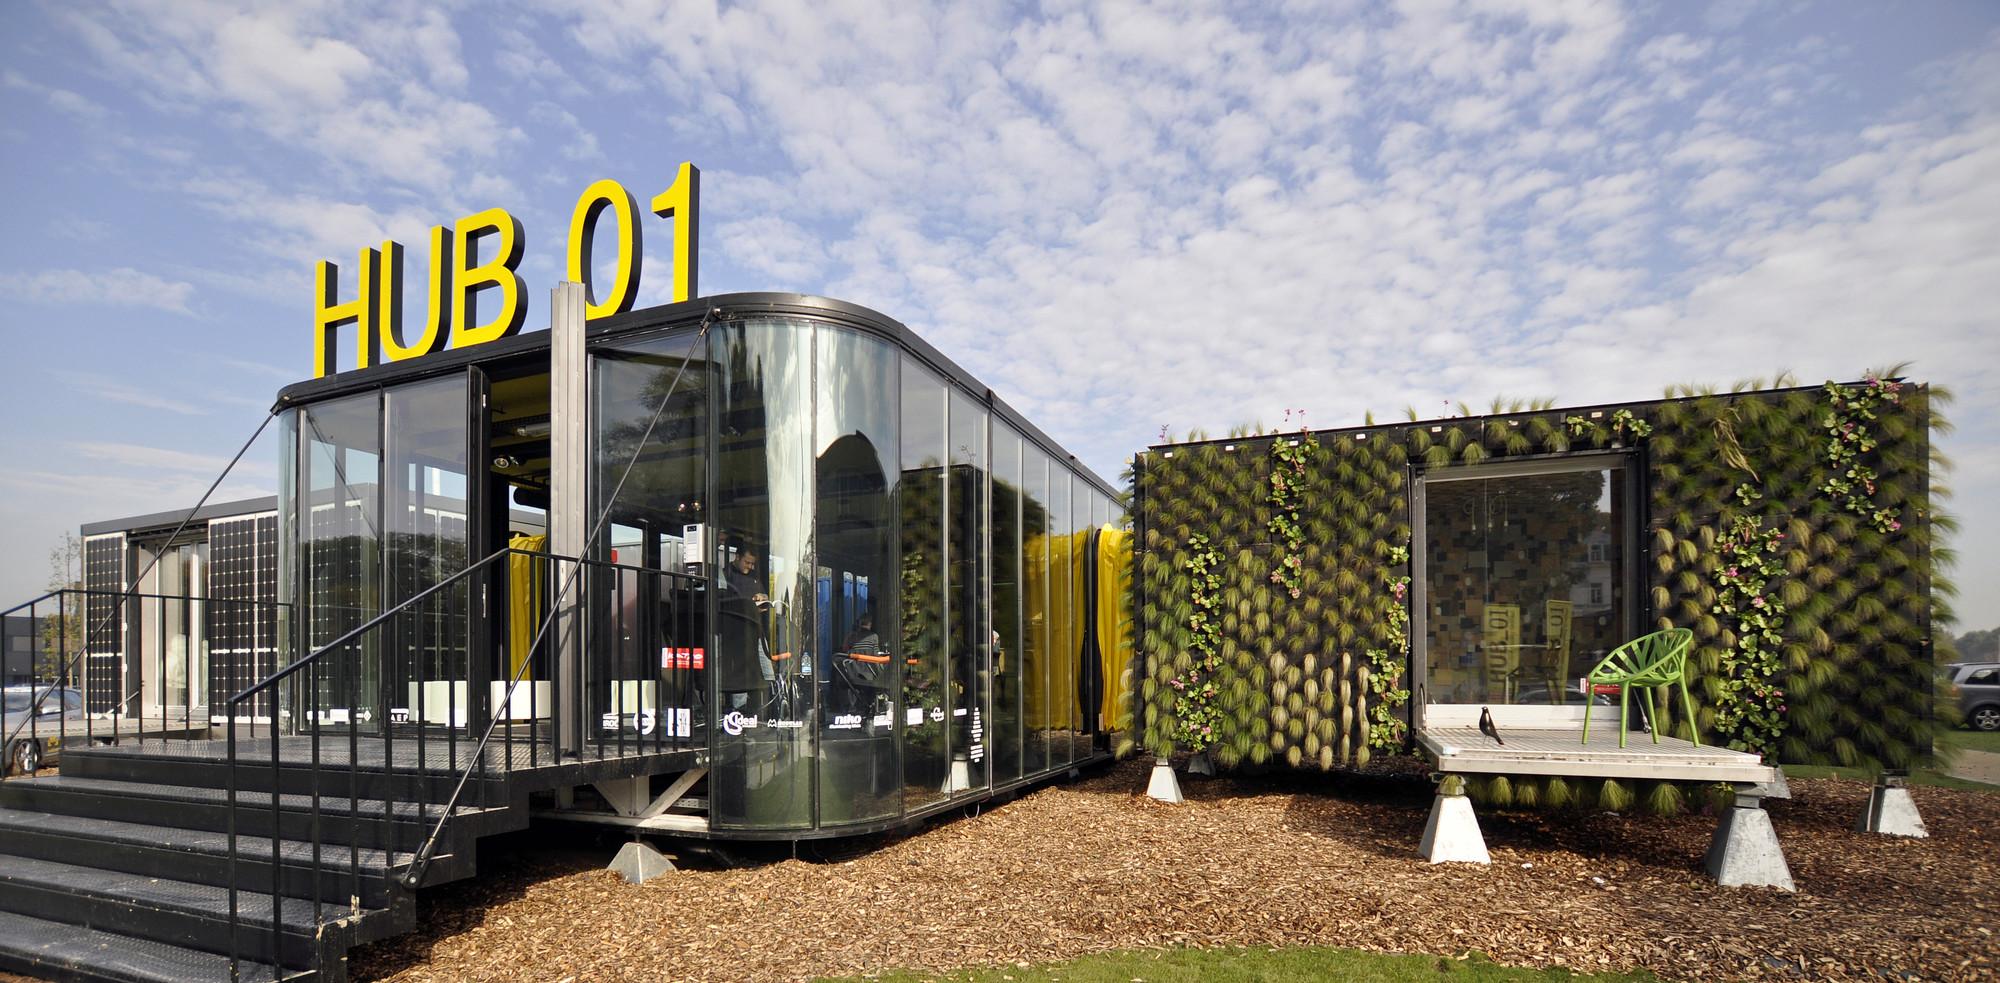 Hub 01 - Mobile Student Housing Terminal / dmvA Architecten + A3 Architects, © Mick Couwenbergh